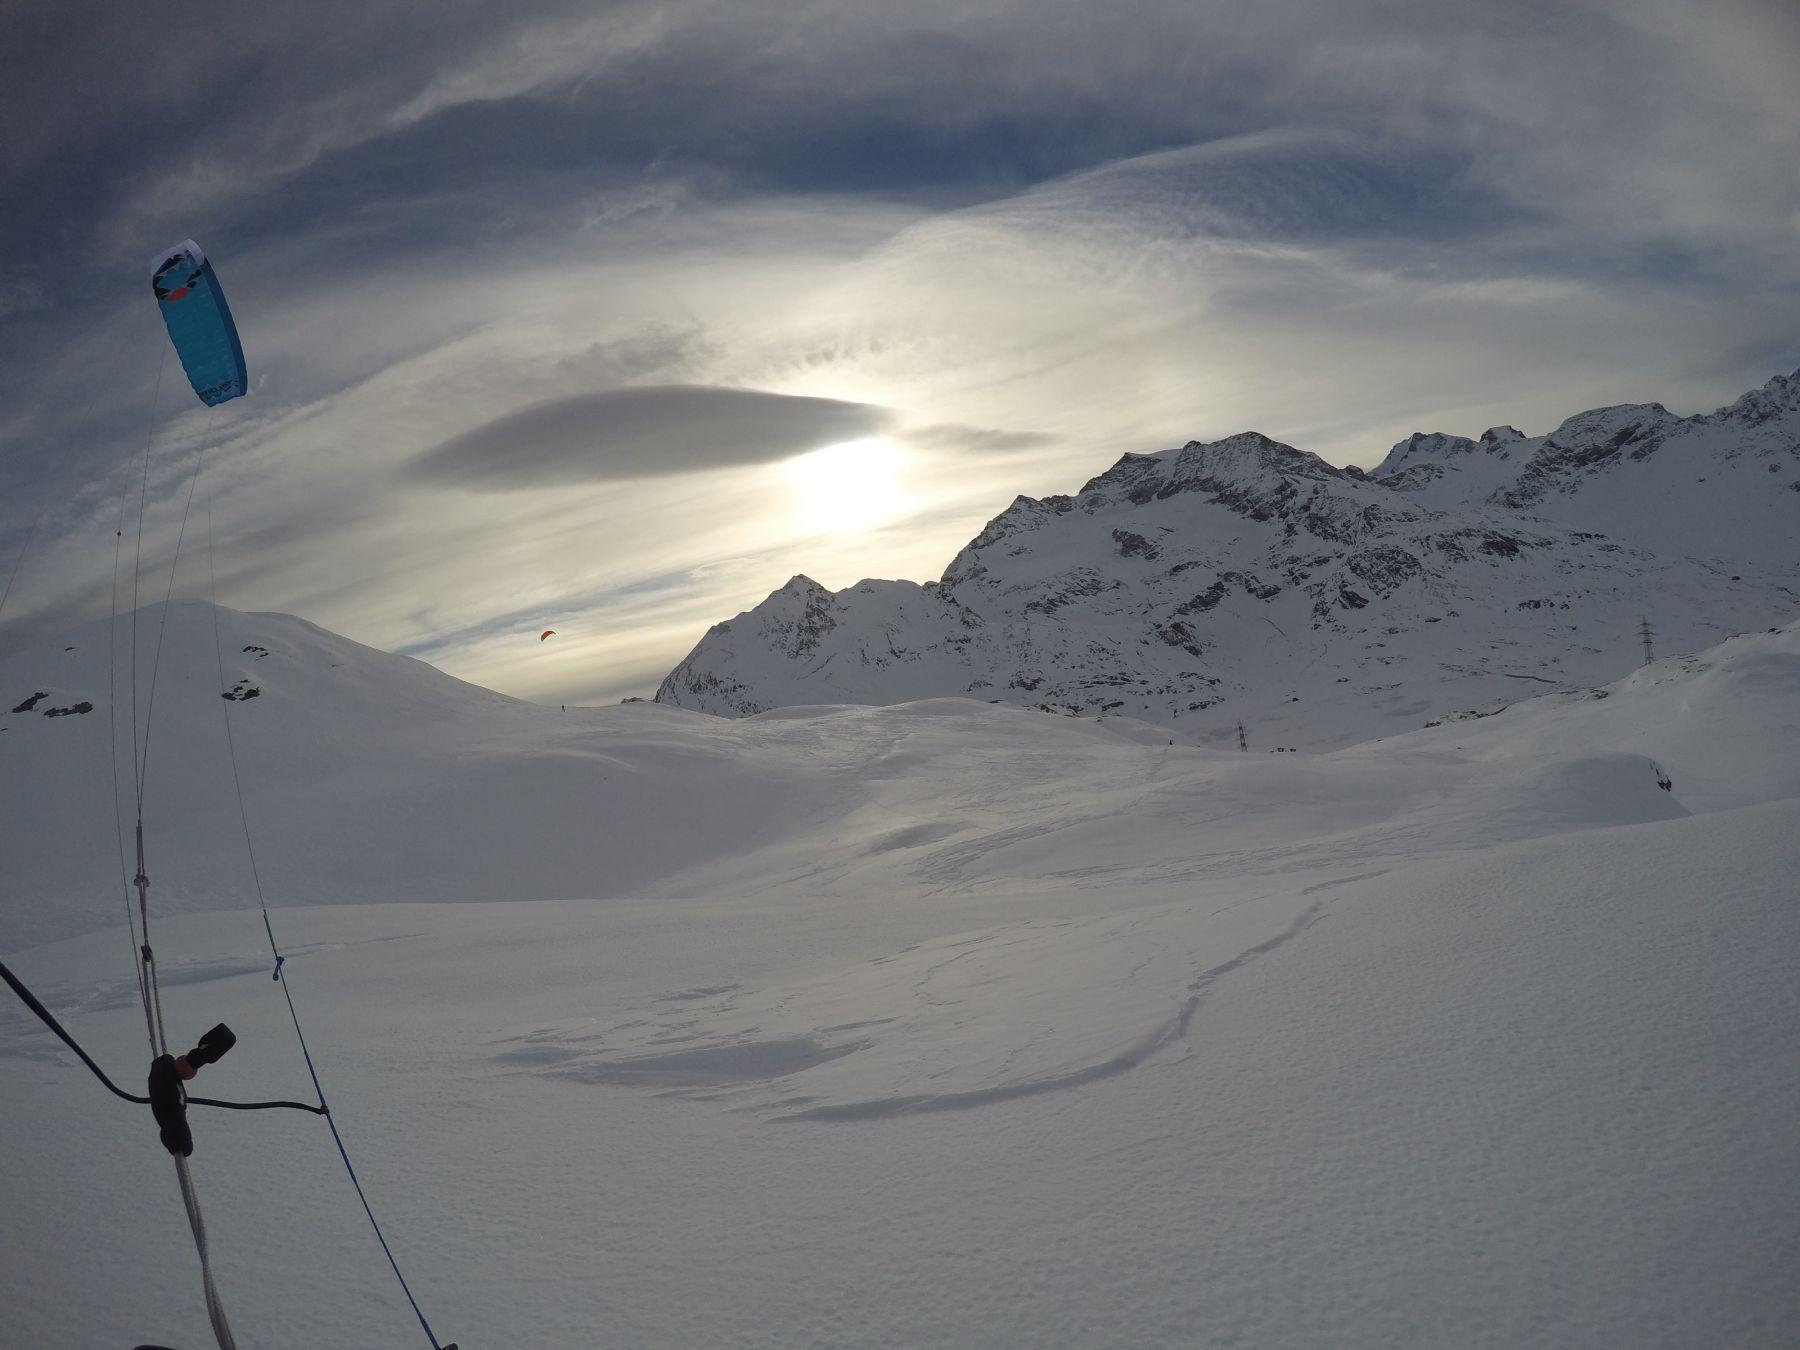 Ozonekites_ExploreV1_snowkite_odenwald_Passo_Bernina_backcountry_1